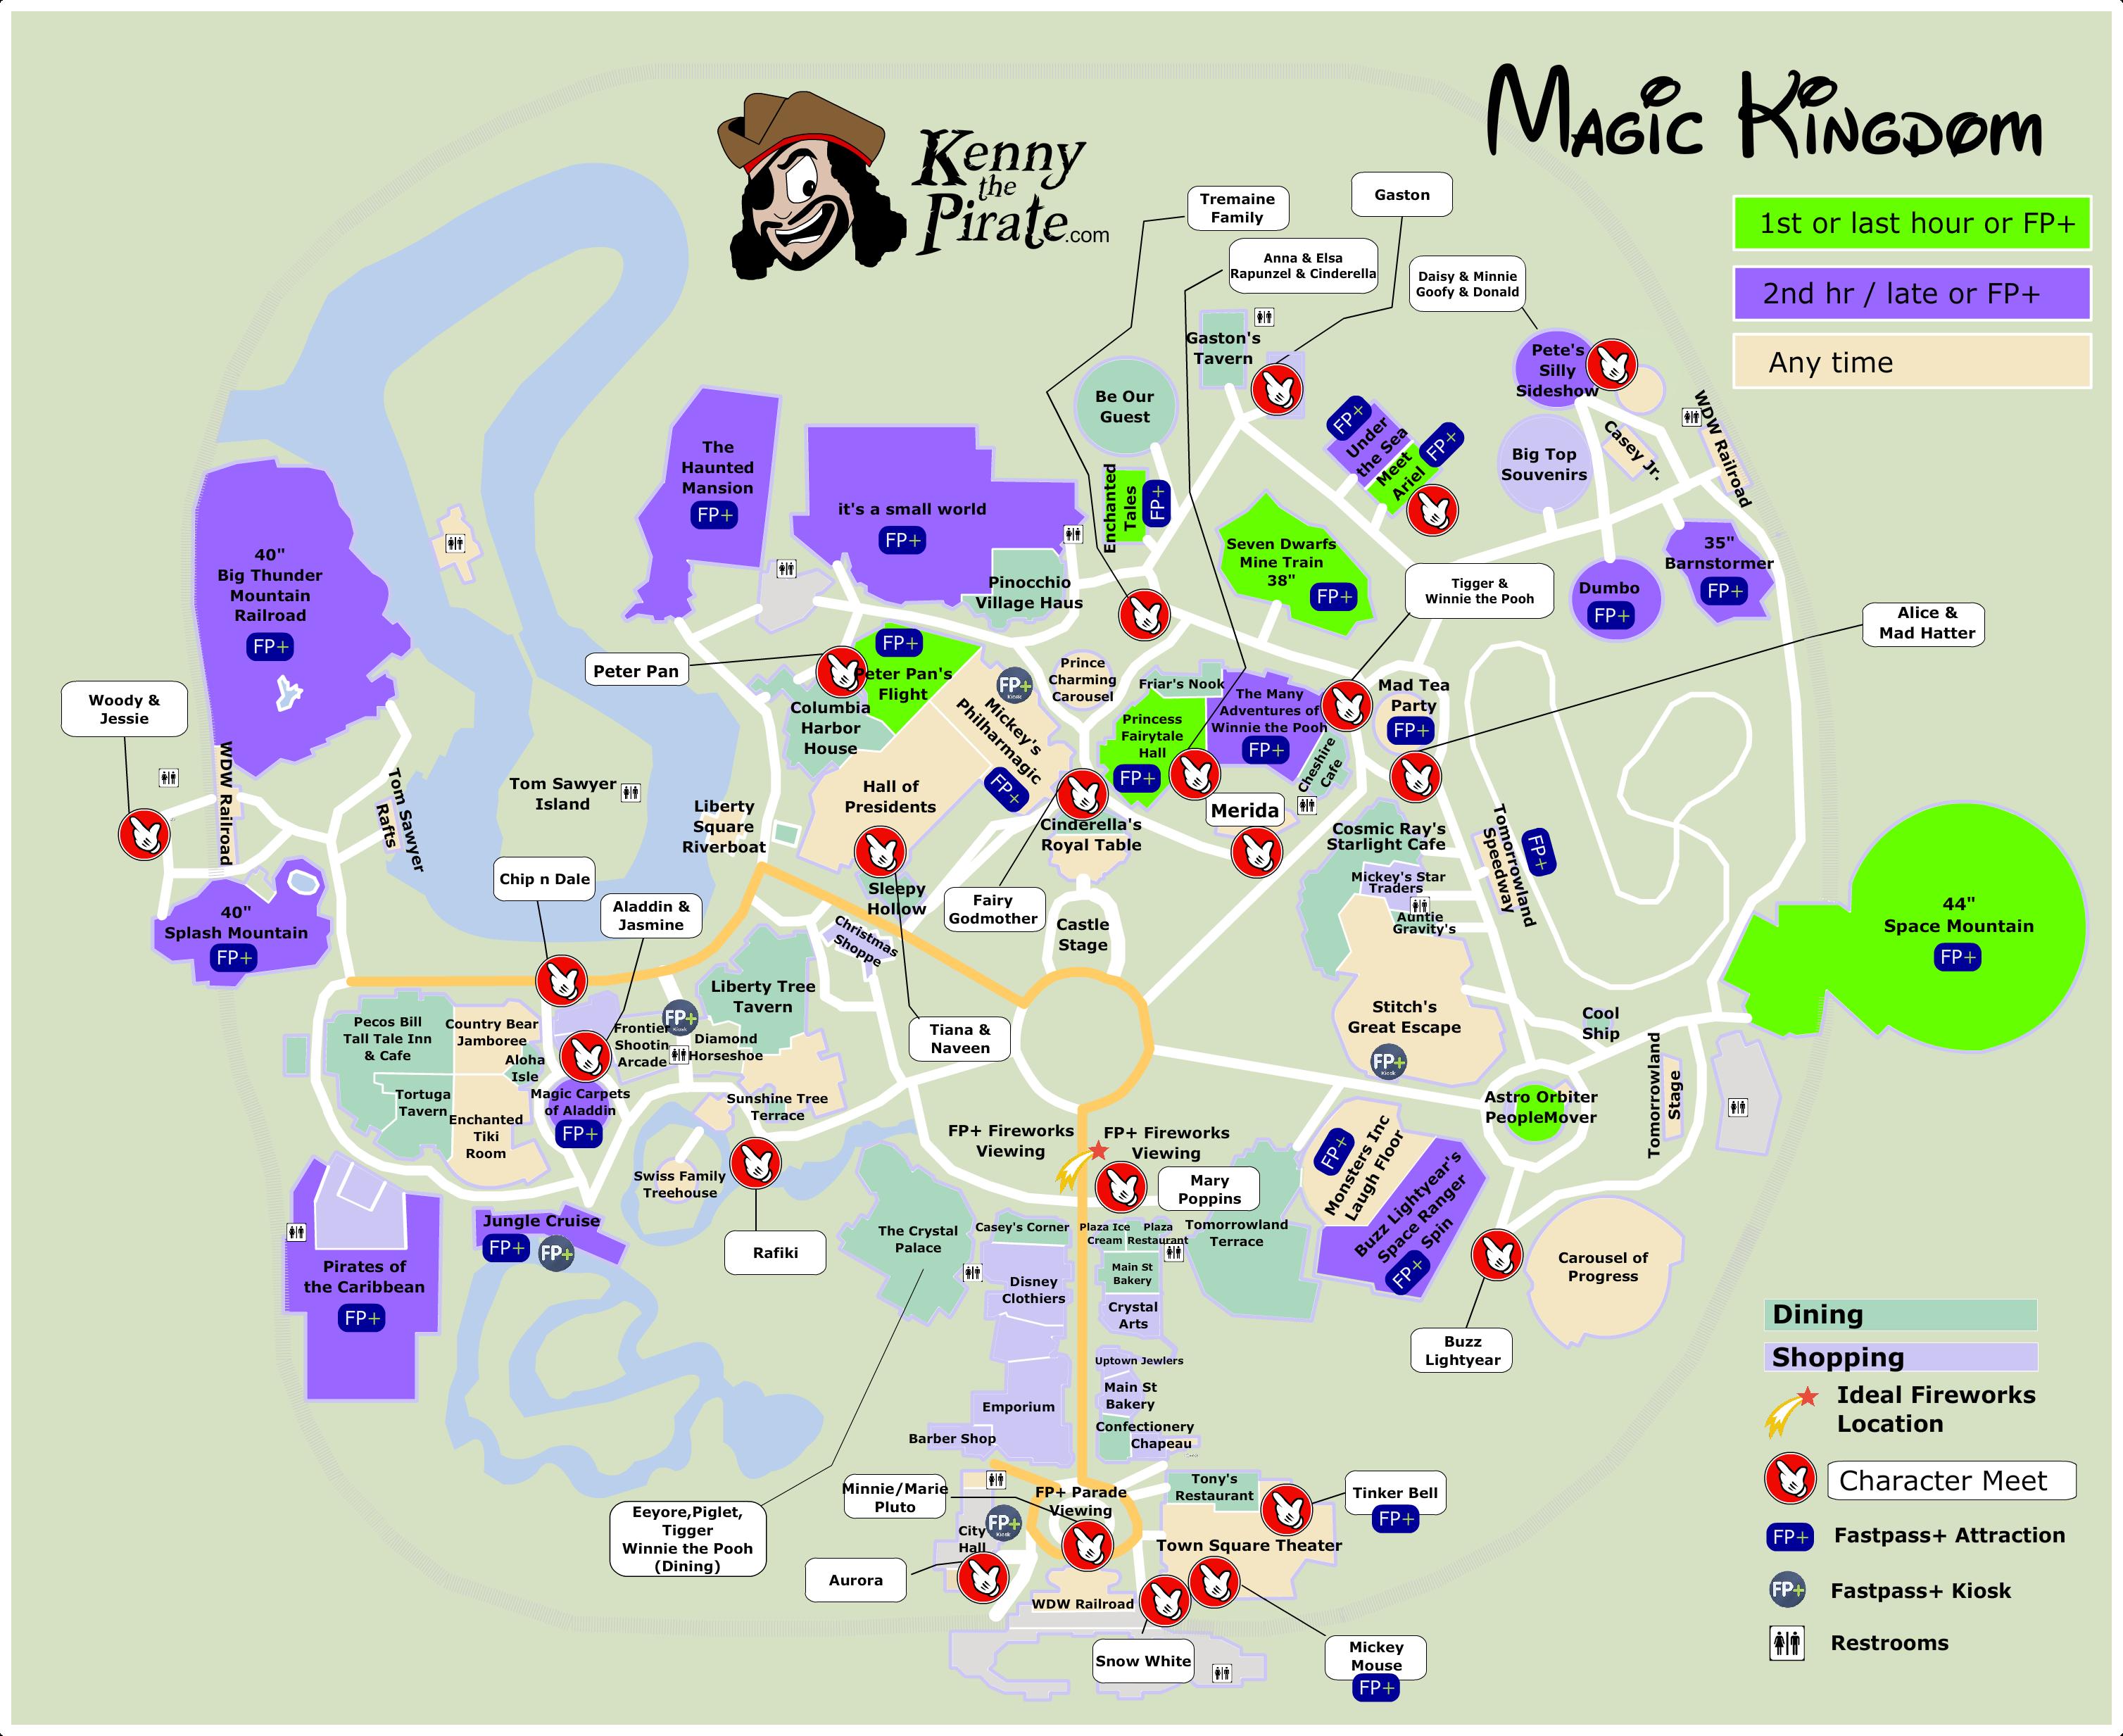 Pin by Christopher Jenkinson on Disney   Magic kingdom map, Magic ...